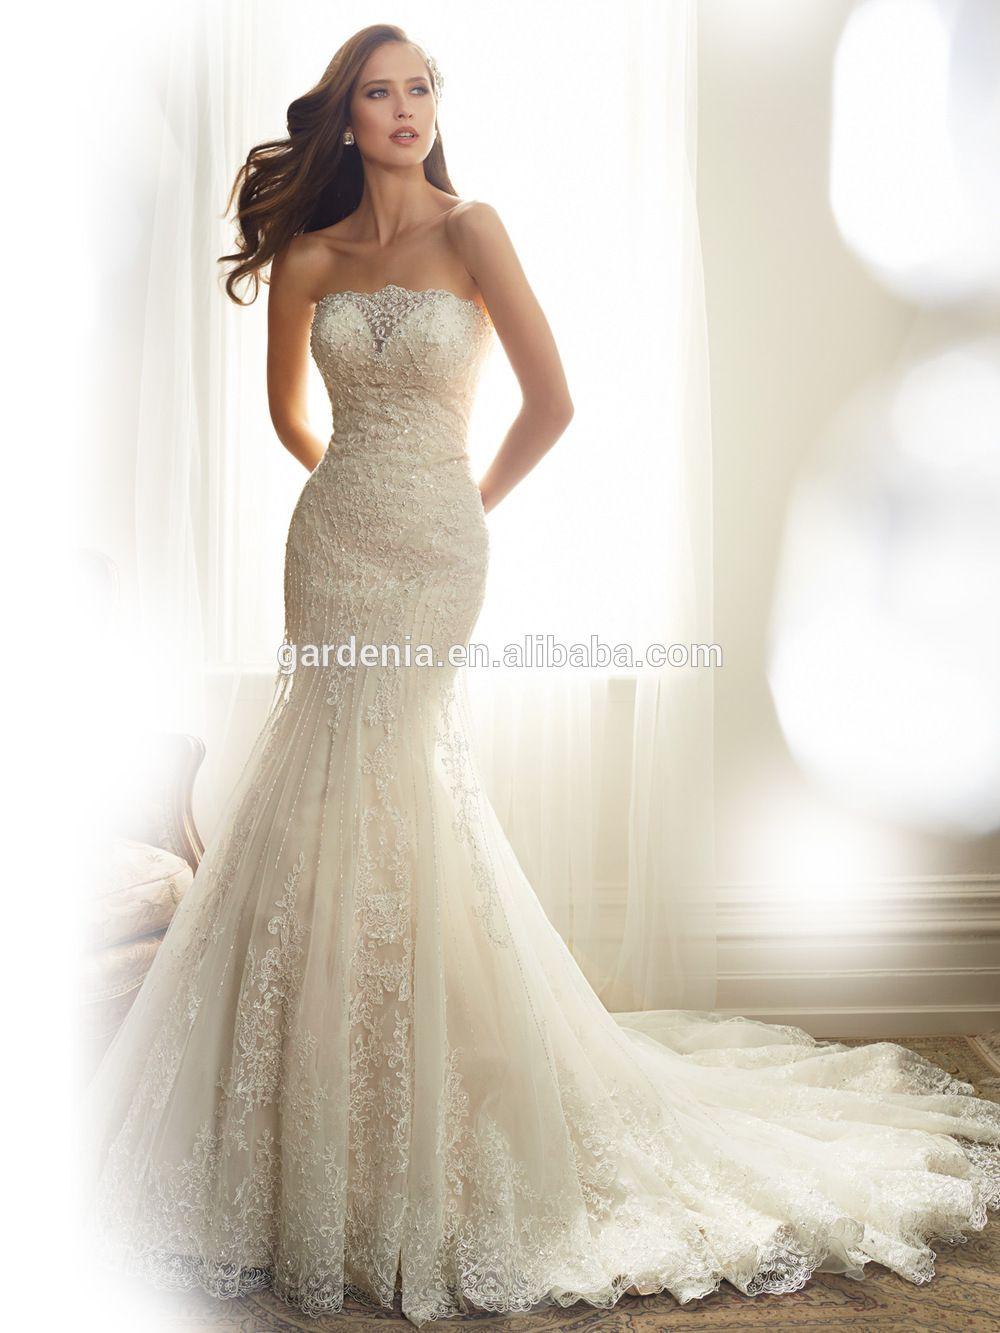 Stunning Luxurious New Model Beaded Long Train Mermaid Lace Wedding Dress Patterns Turkish Wedding Dress